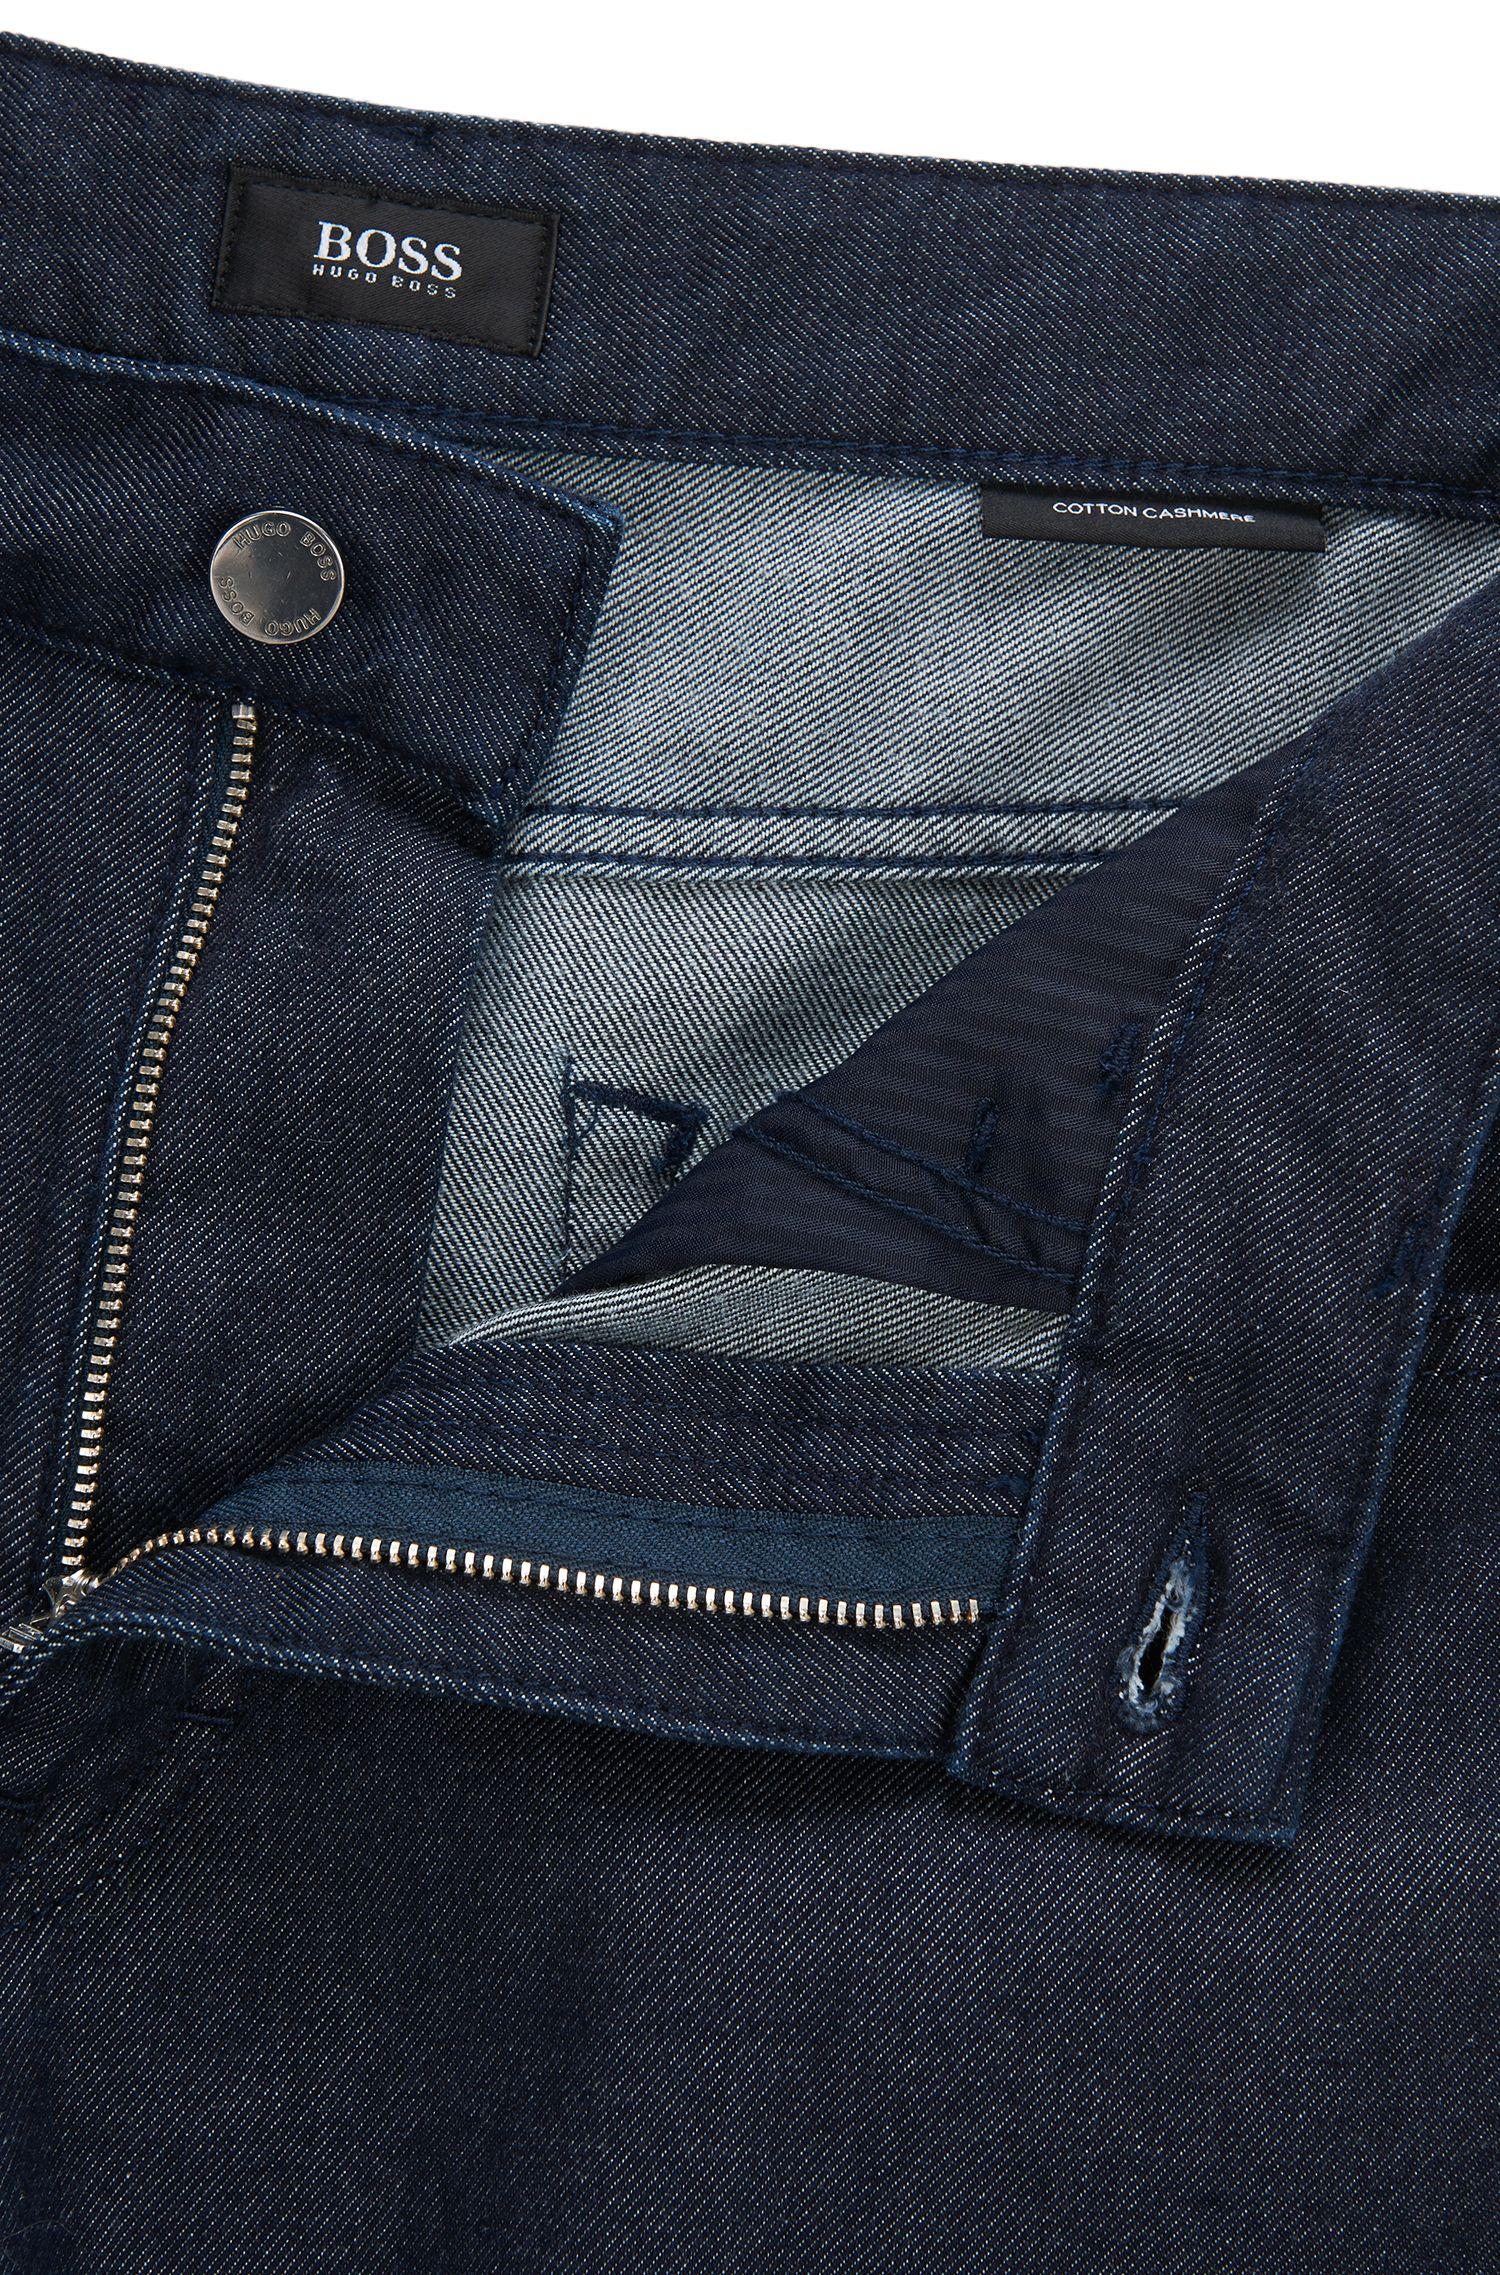 9.5 oz Cotton Cashmere Jeans, Comfort Fit | Albany, Dark Blue